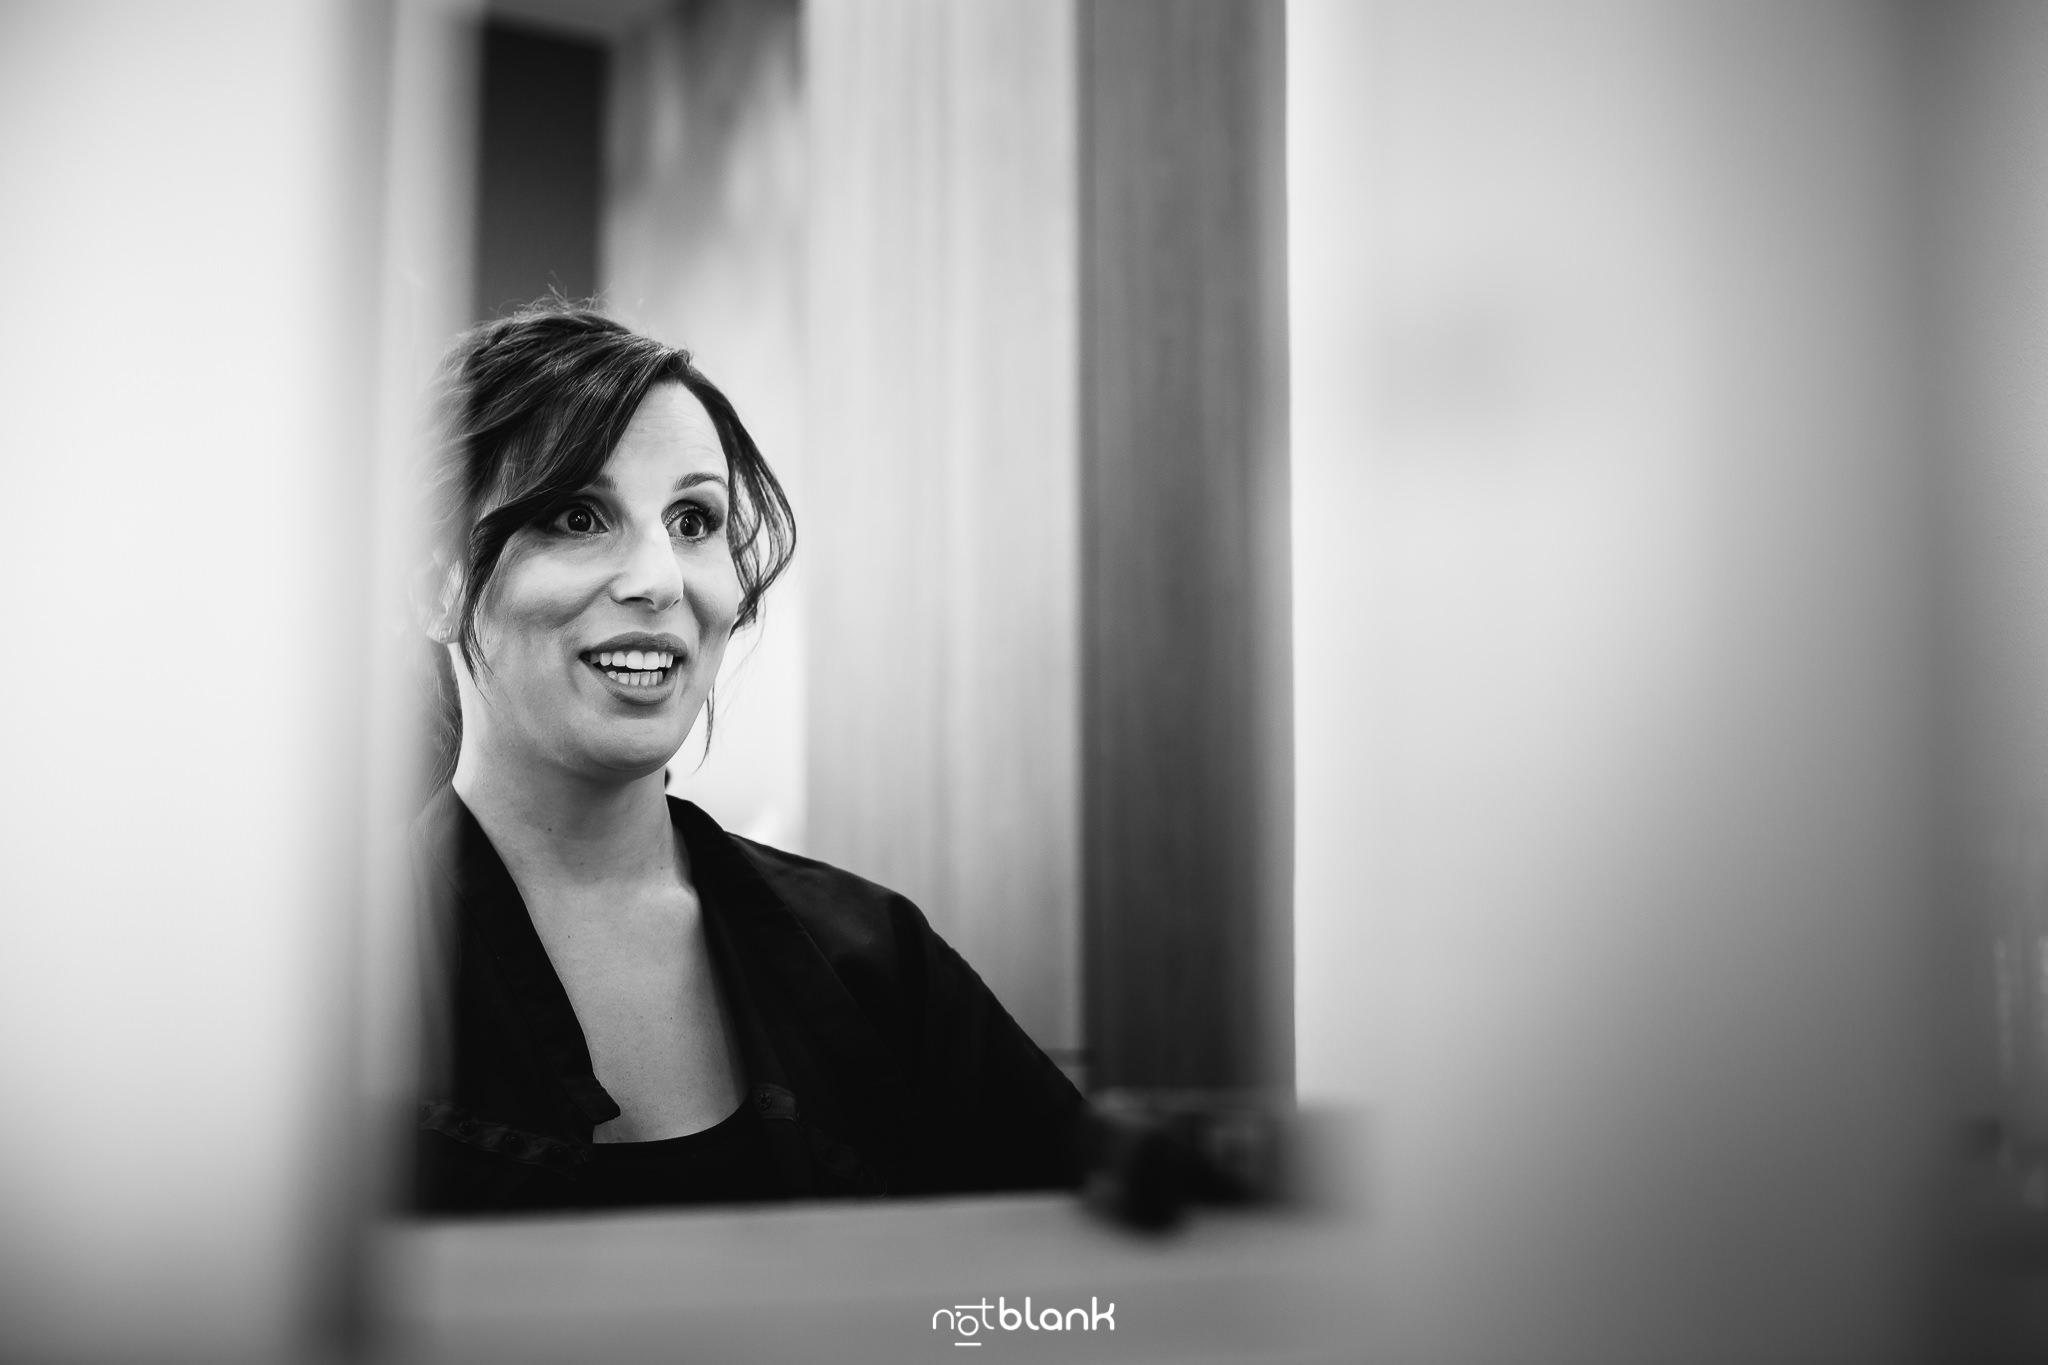 Boda-Maite-David-Preparativos-Novia-En-Peluqueria. Reportaje realizado por Notblank fotógrafos de boda